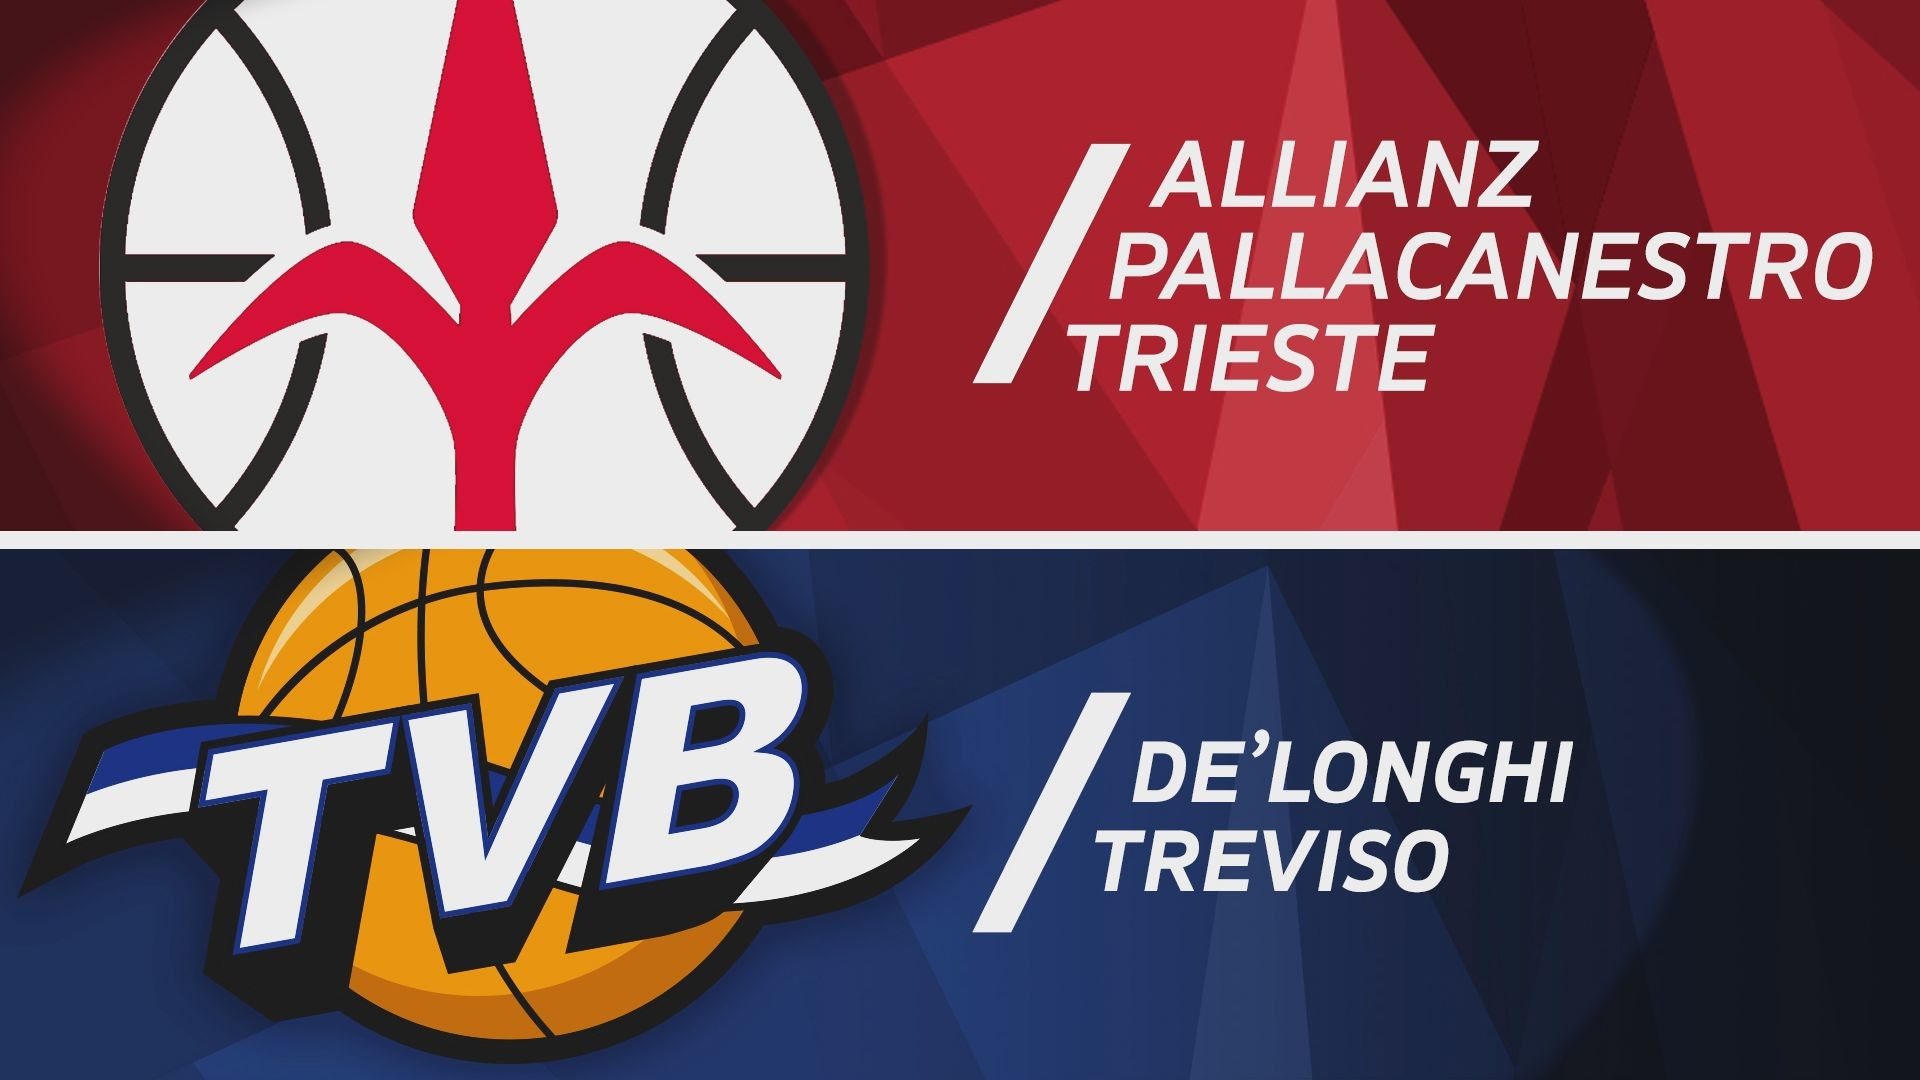 Allianz Pallacanestro Trieste-De'Longhi Treviso